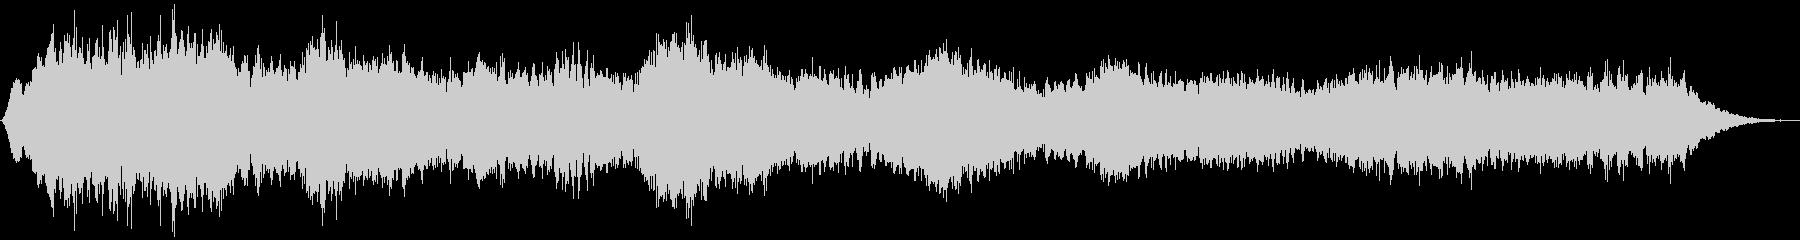 PADS 不気味な鐘01の未再生の波形